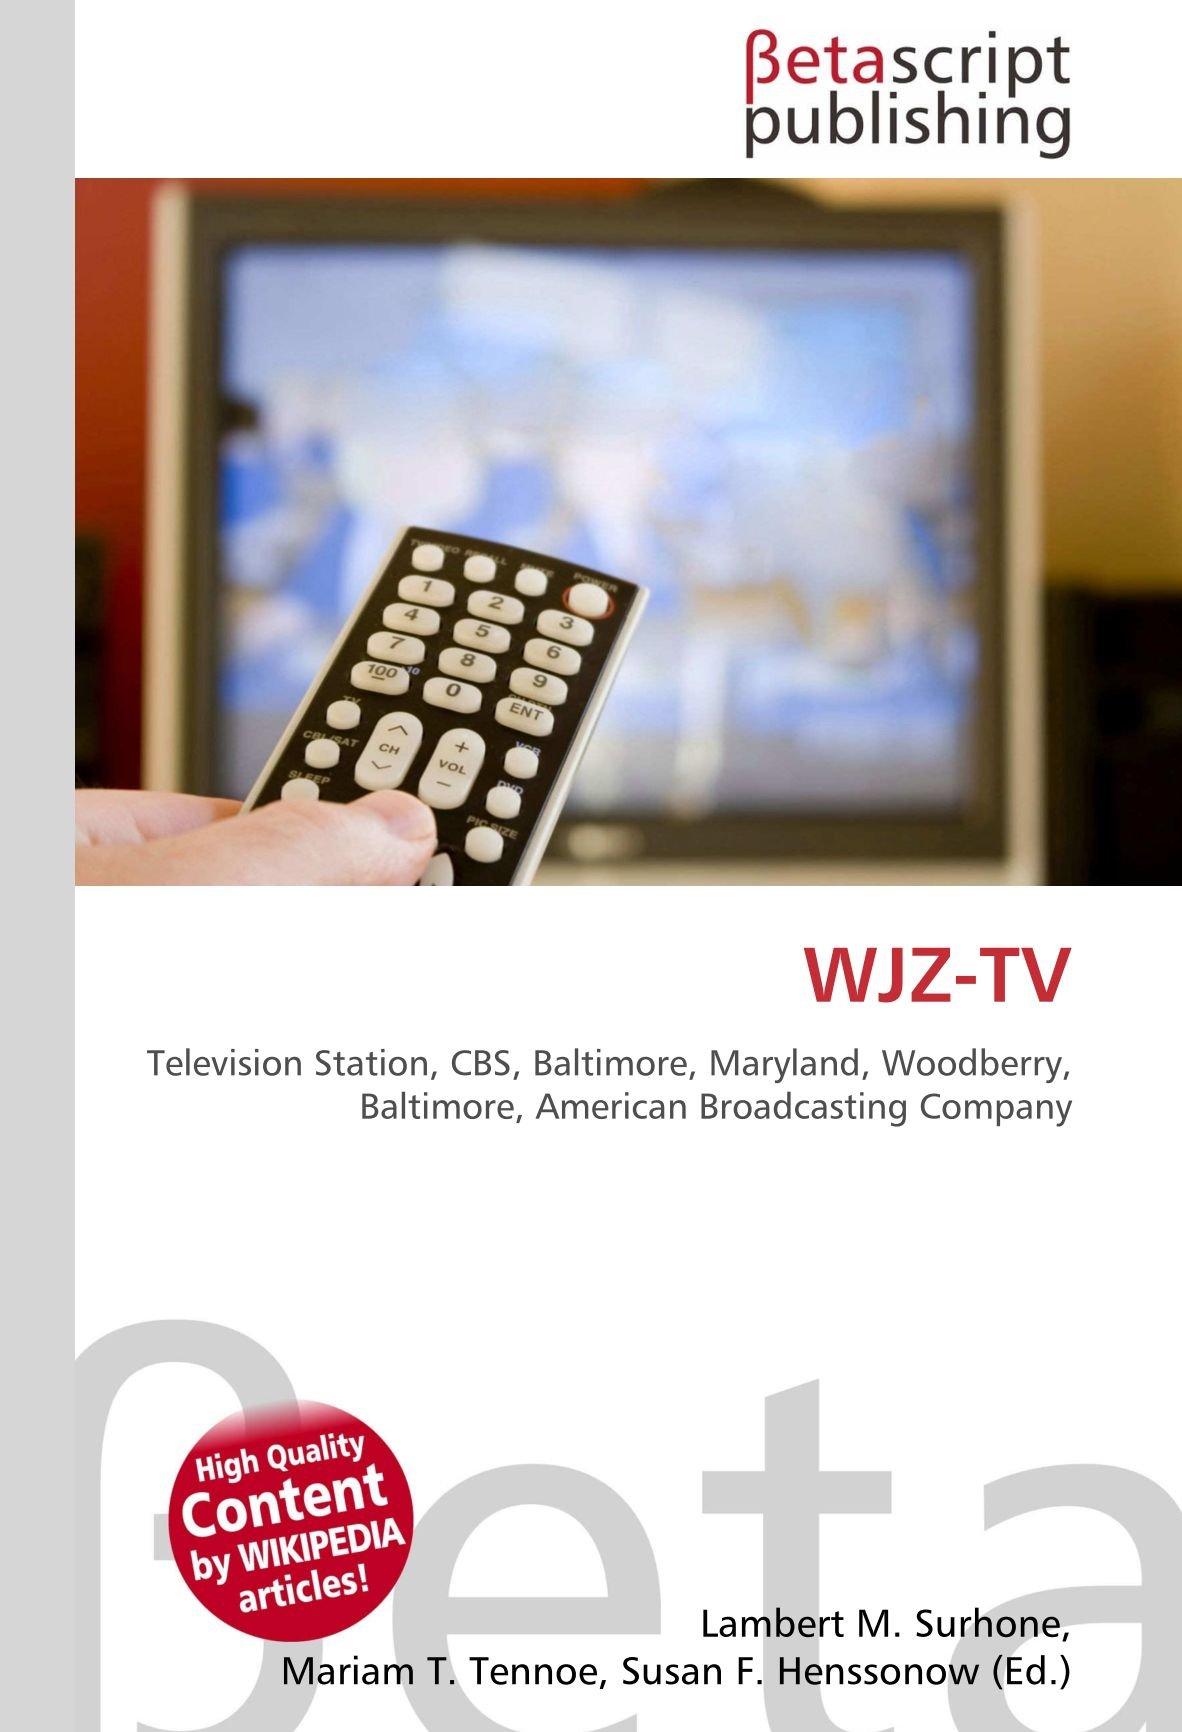 WJZ-TV: Television Station, CBS, Baltimore, Maryland, Woodberry, Baltimore, American Broadcasting Company: Amazon.es: Surhone, Lambert M., Tennoe, Mariam T., Henssonow, Susan F.: Libros en idiomas extranjeros